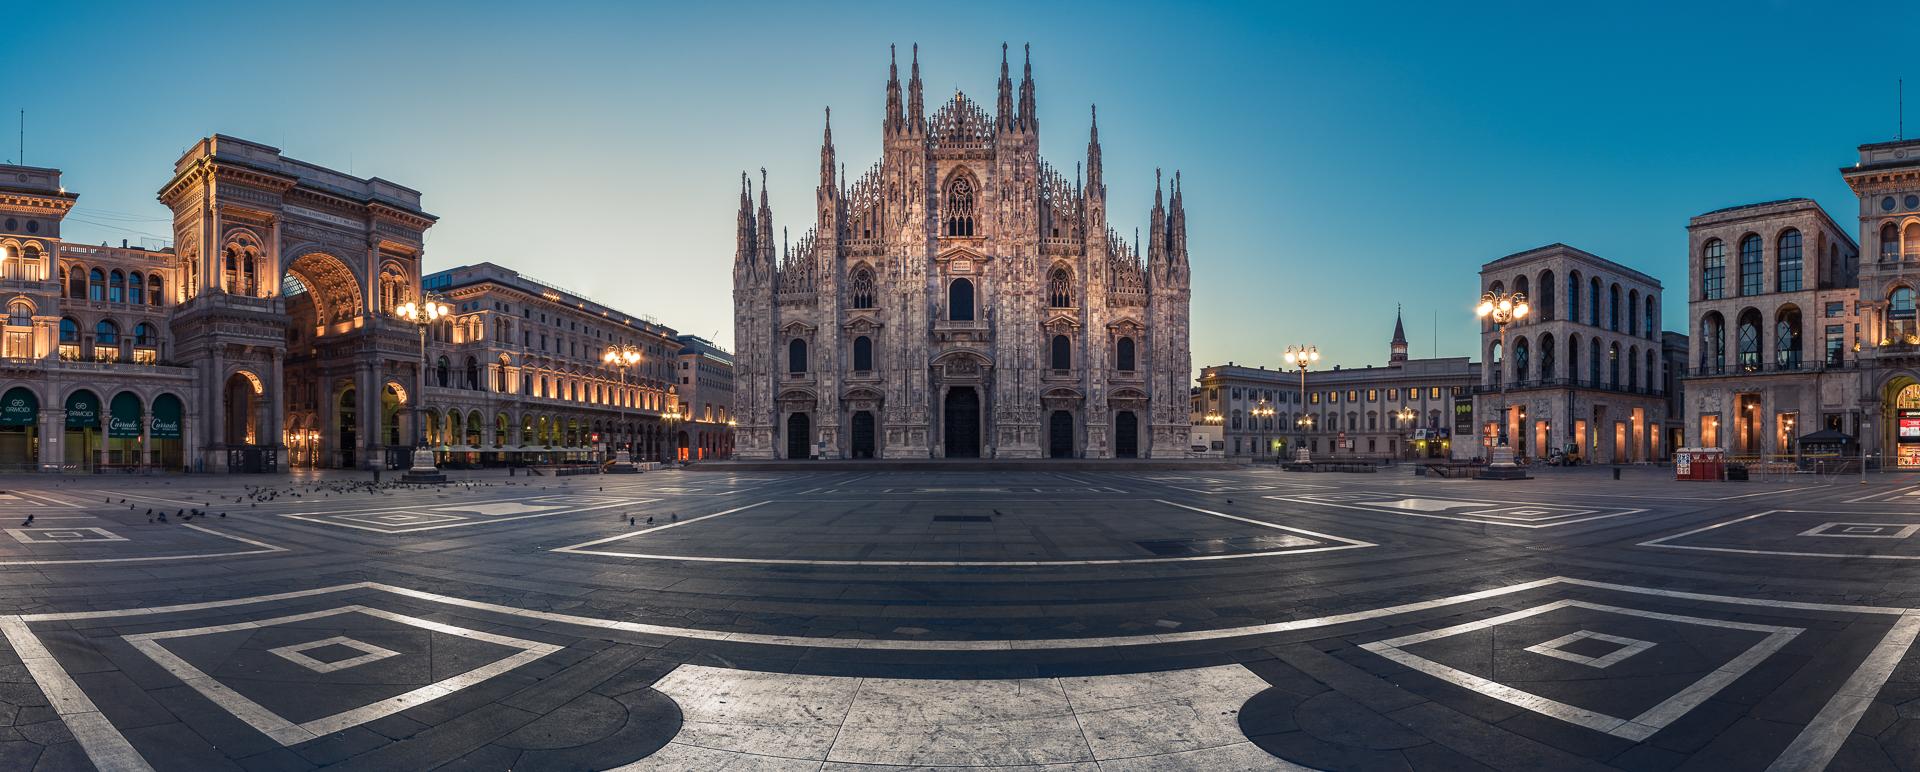 Milan, Basilica, Panorama, Blue Hour, Lombardia, Italy, 2014